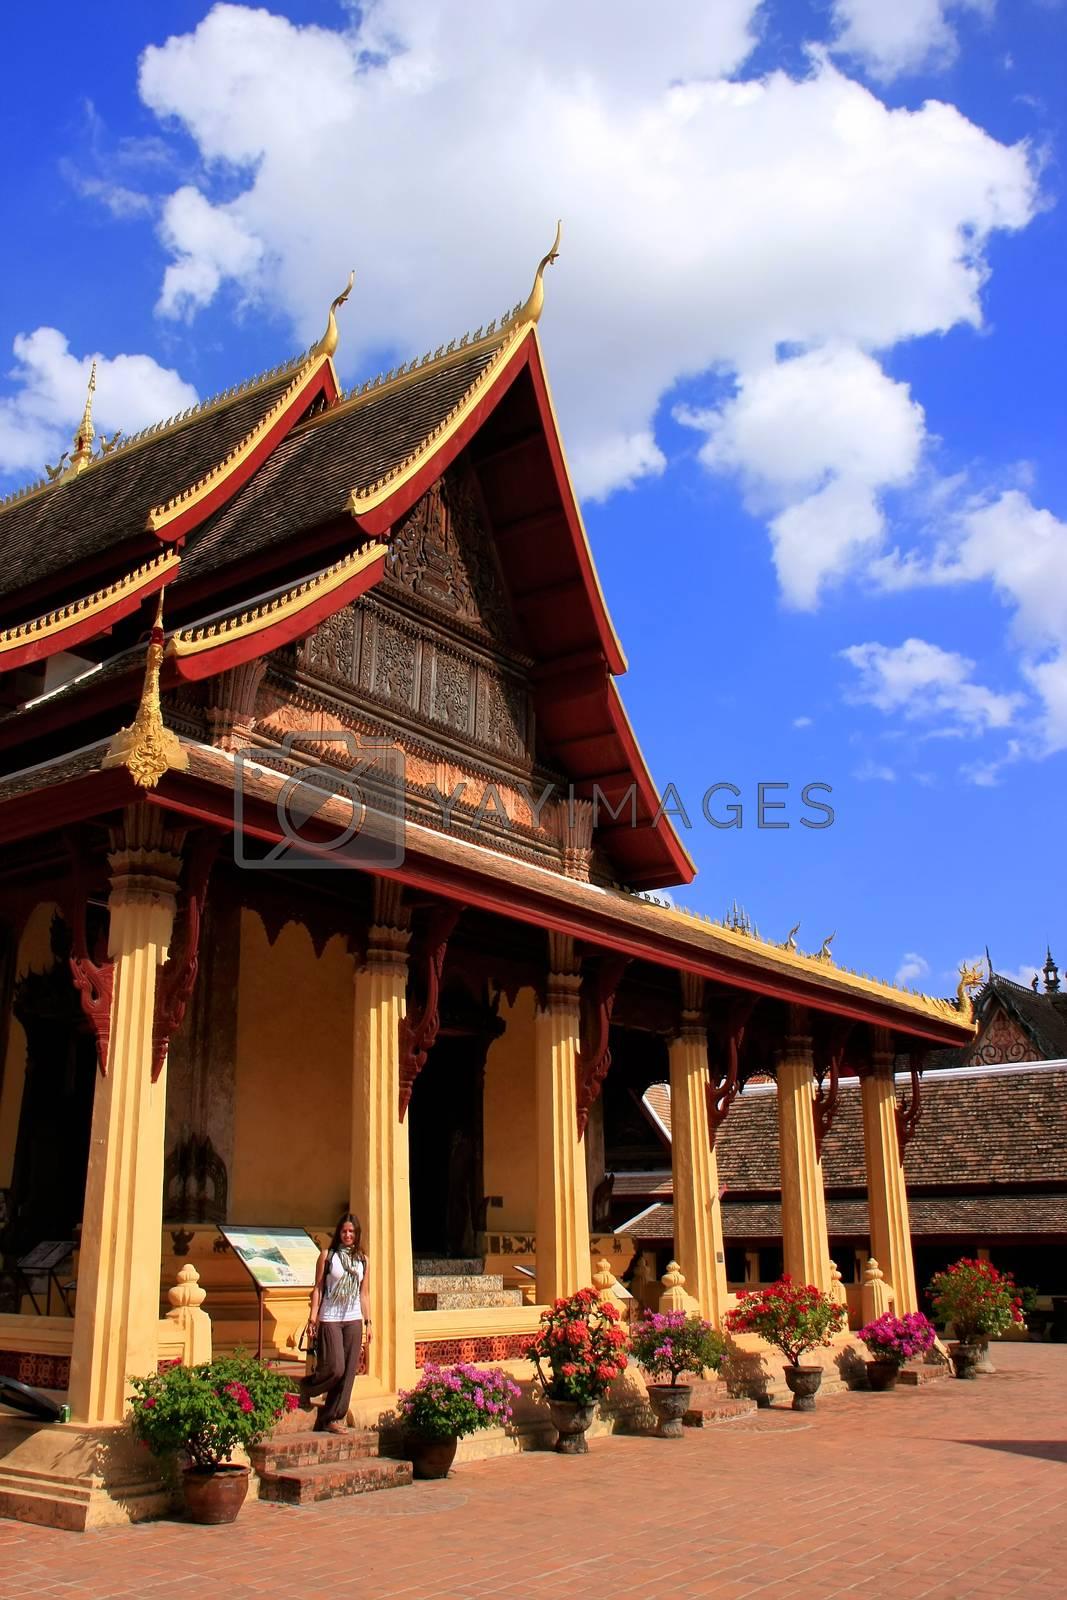 Royalty free image of Wat Si Saket, Vientiane, Laos by donya_nedomam